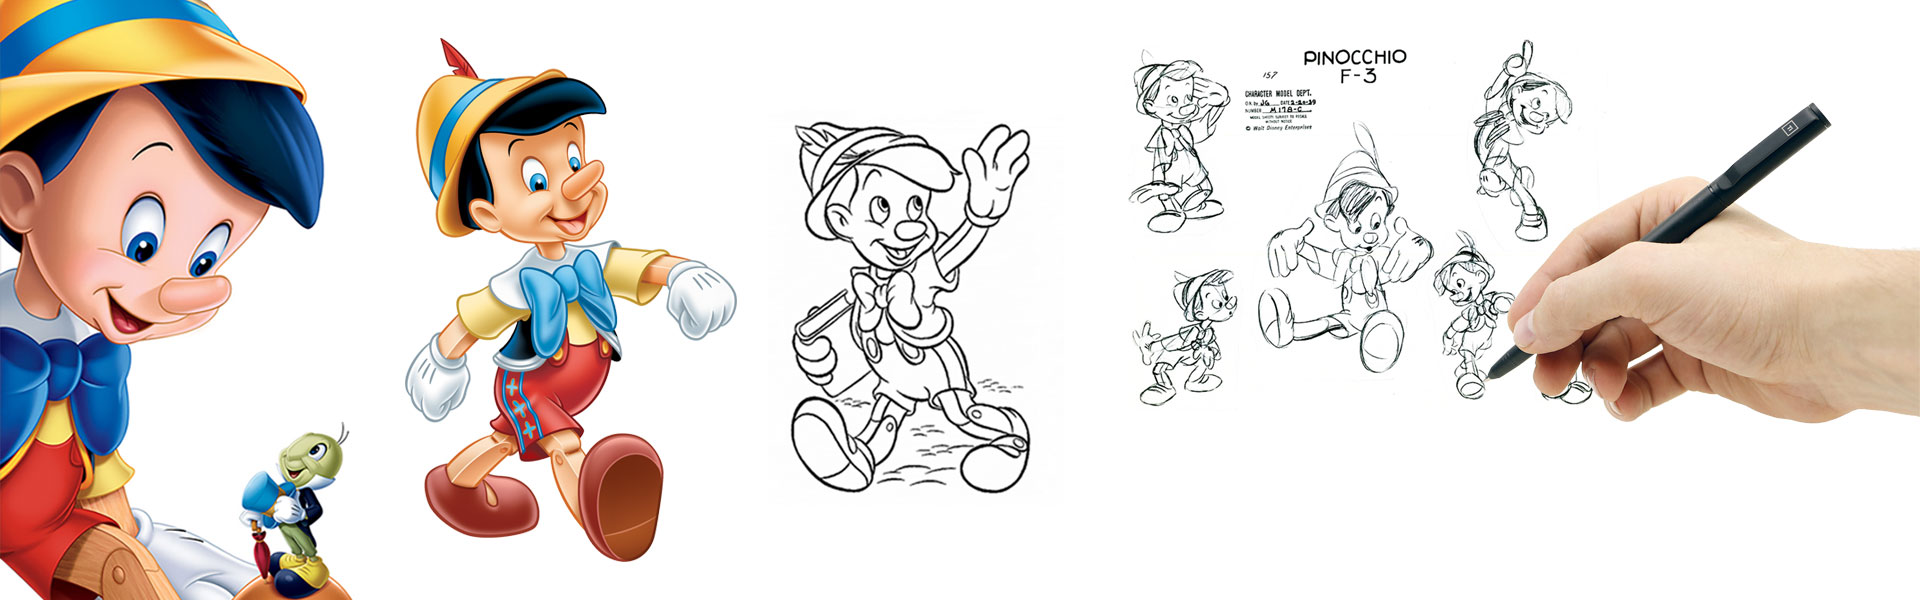 tarahi character - آموزش طراحی کاراکتر